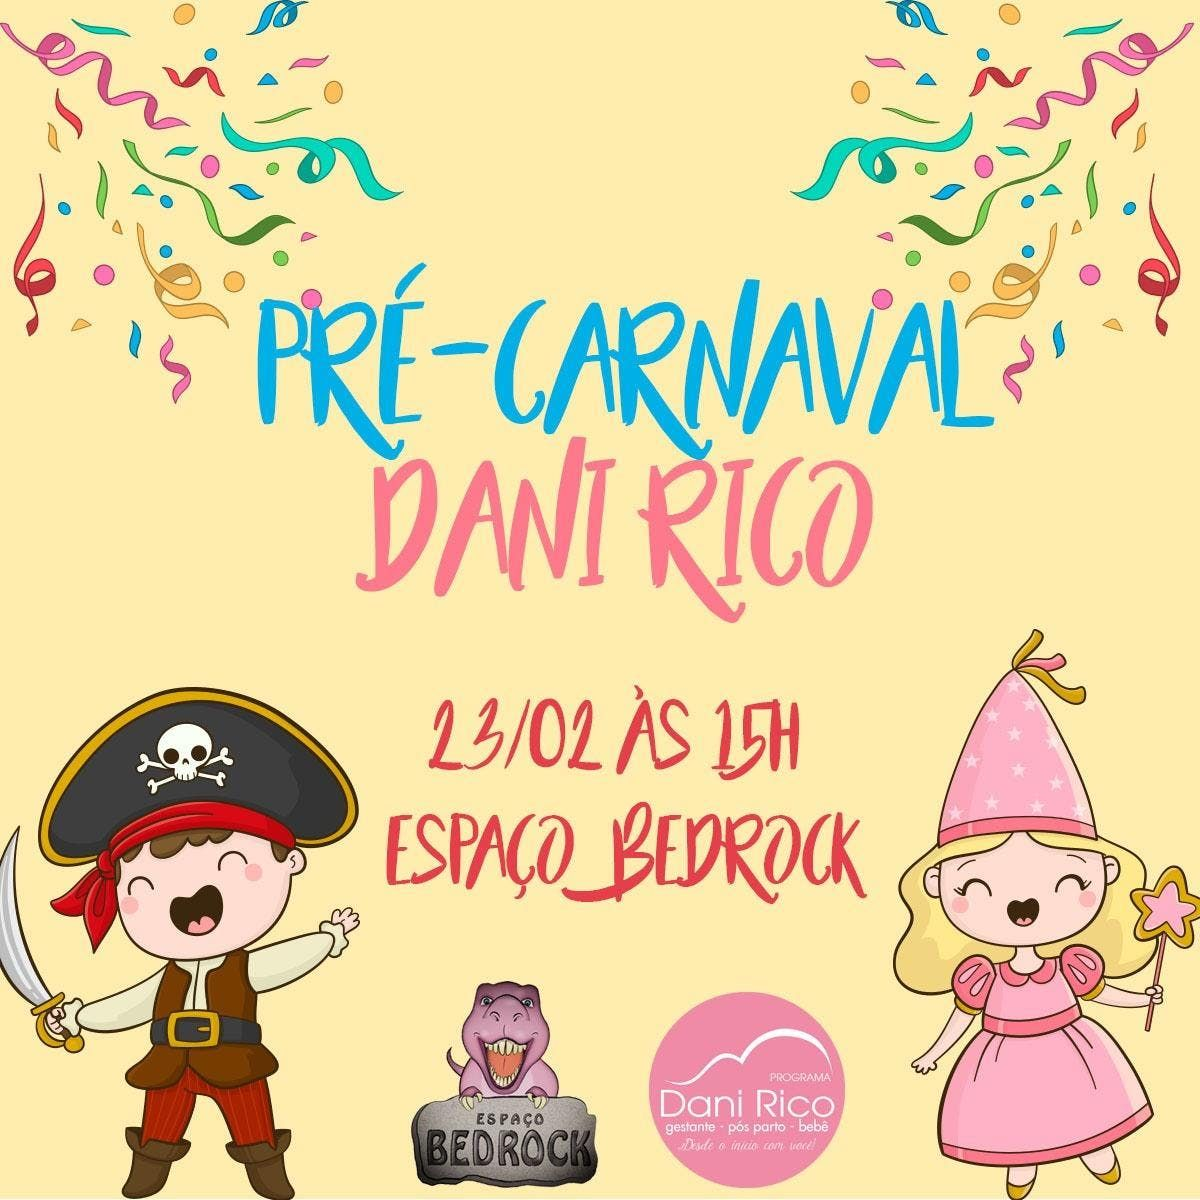 Pr Carnaval Dani Rico